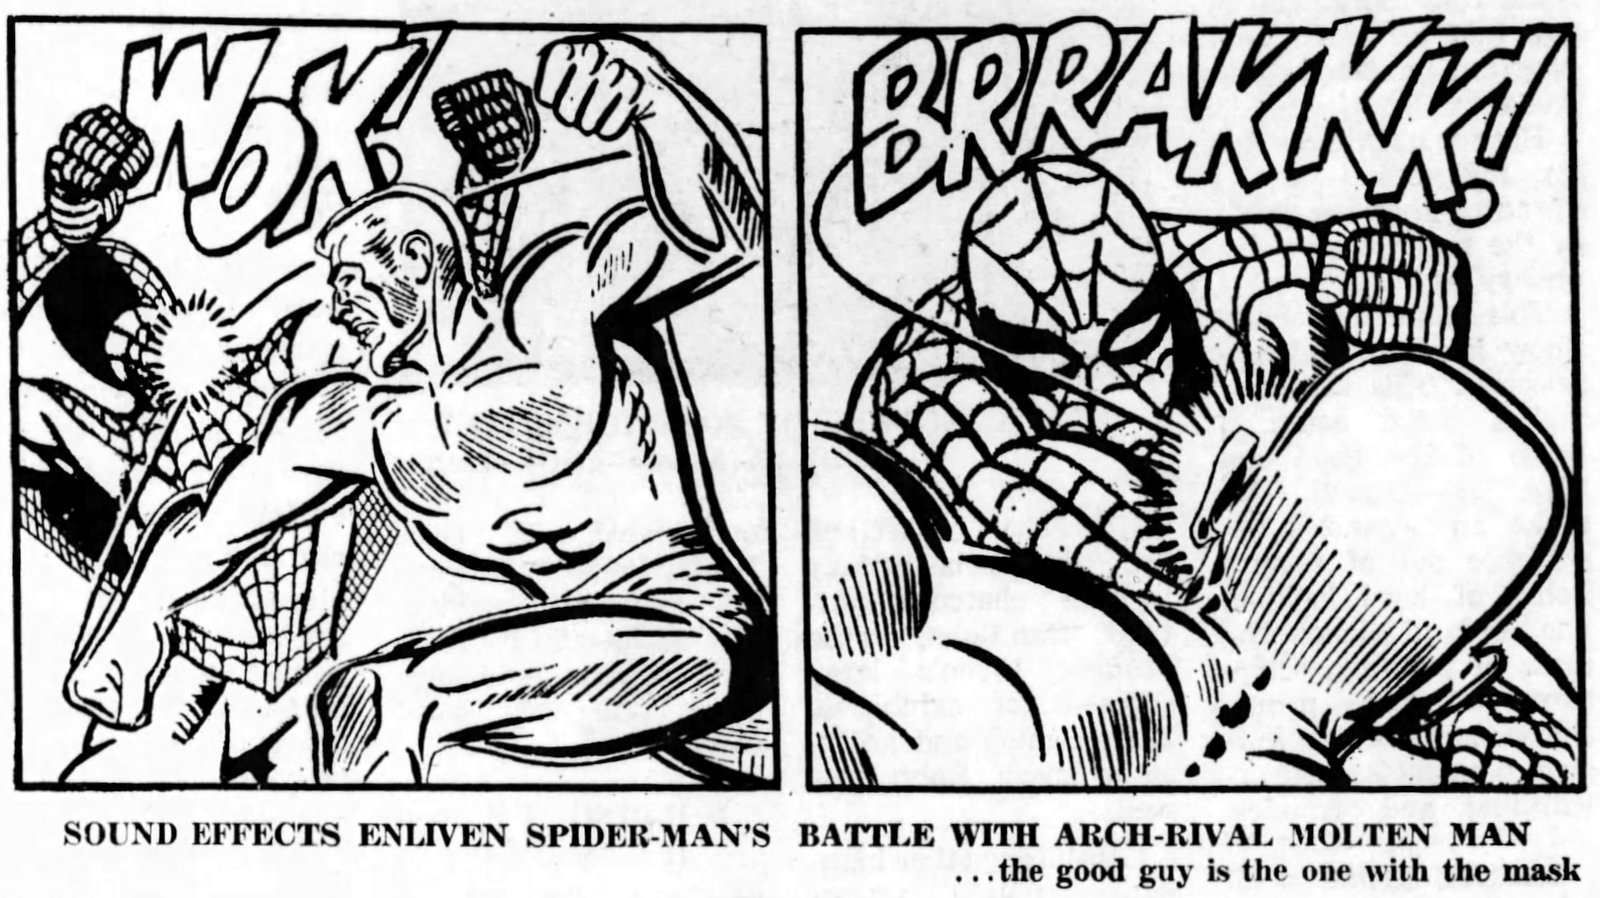 Spider-Man vs Molten Man - 1966 = super heroes